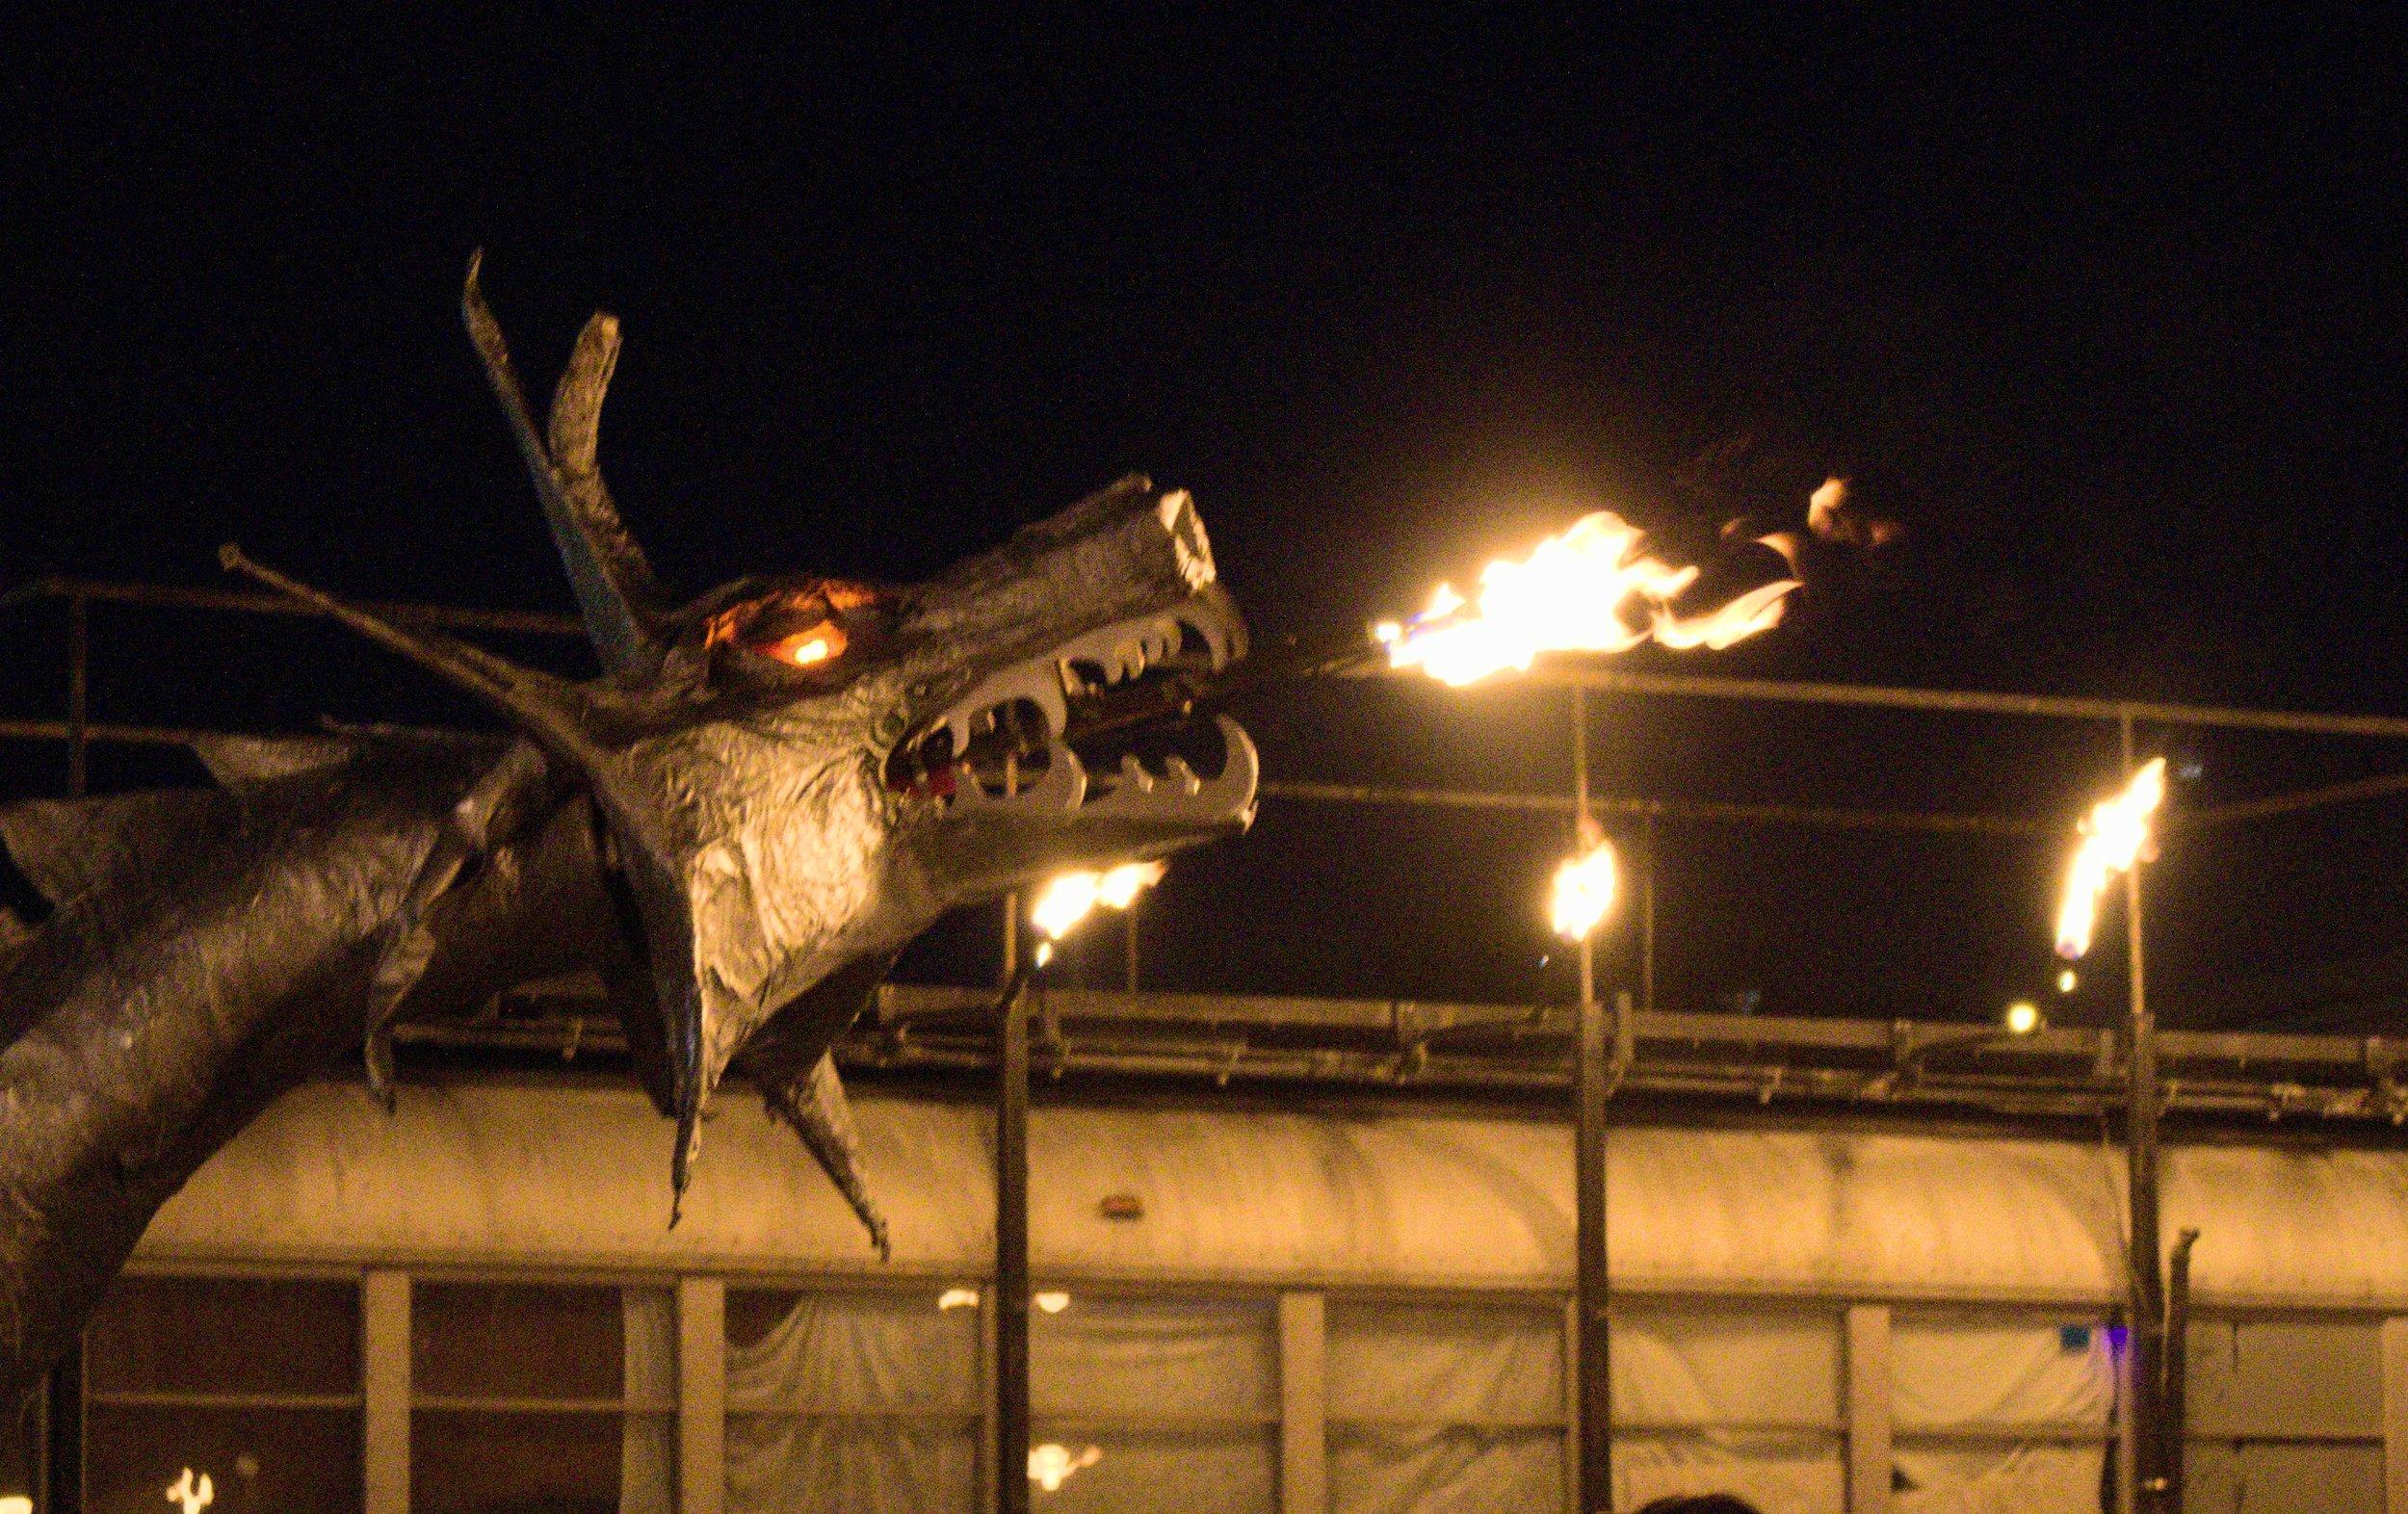 from Captain Nemo's Flaming Carnival